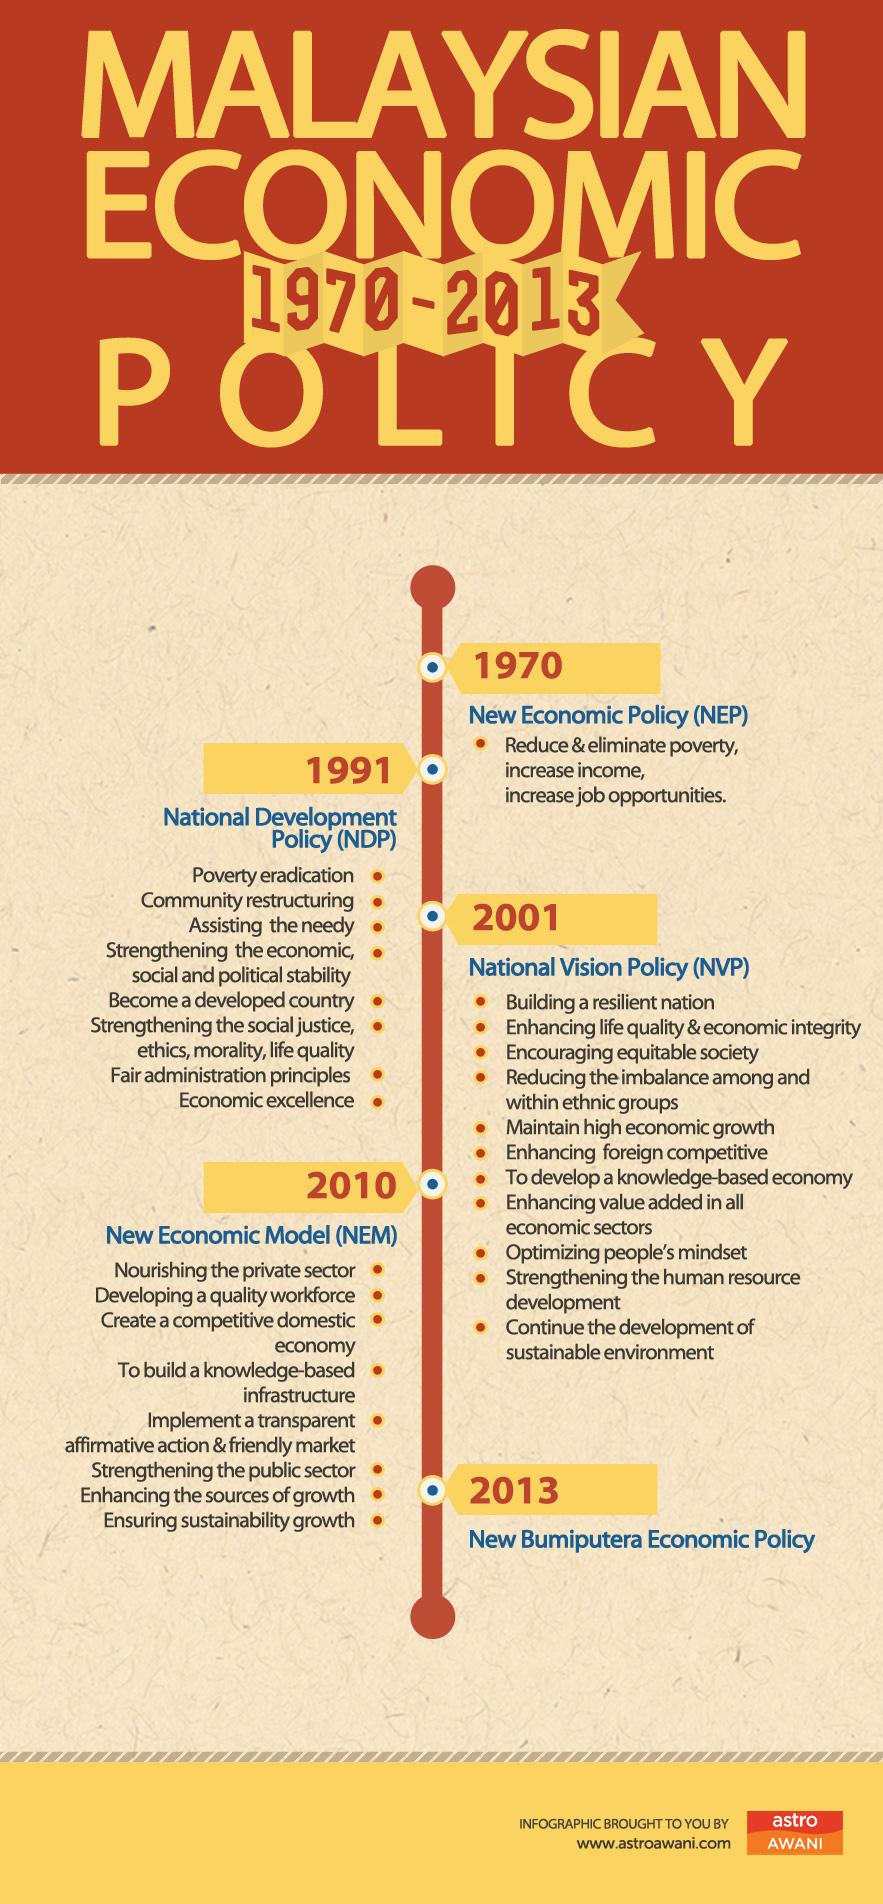 Malaysian Economic Policies (1970-2013)